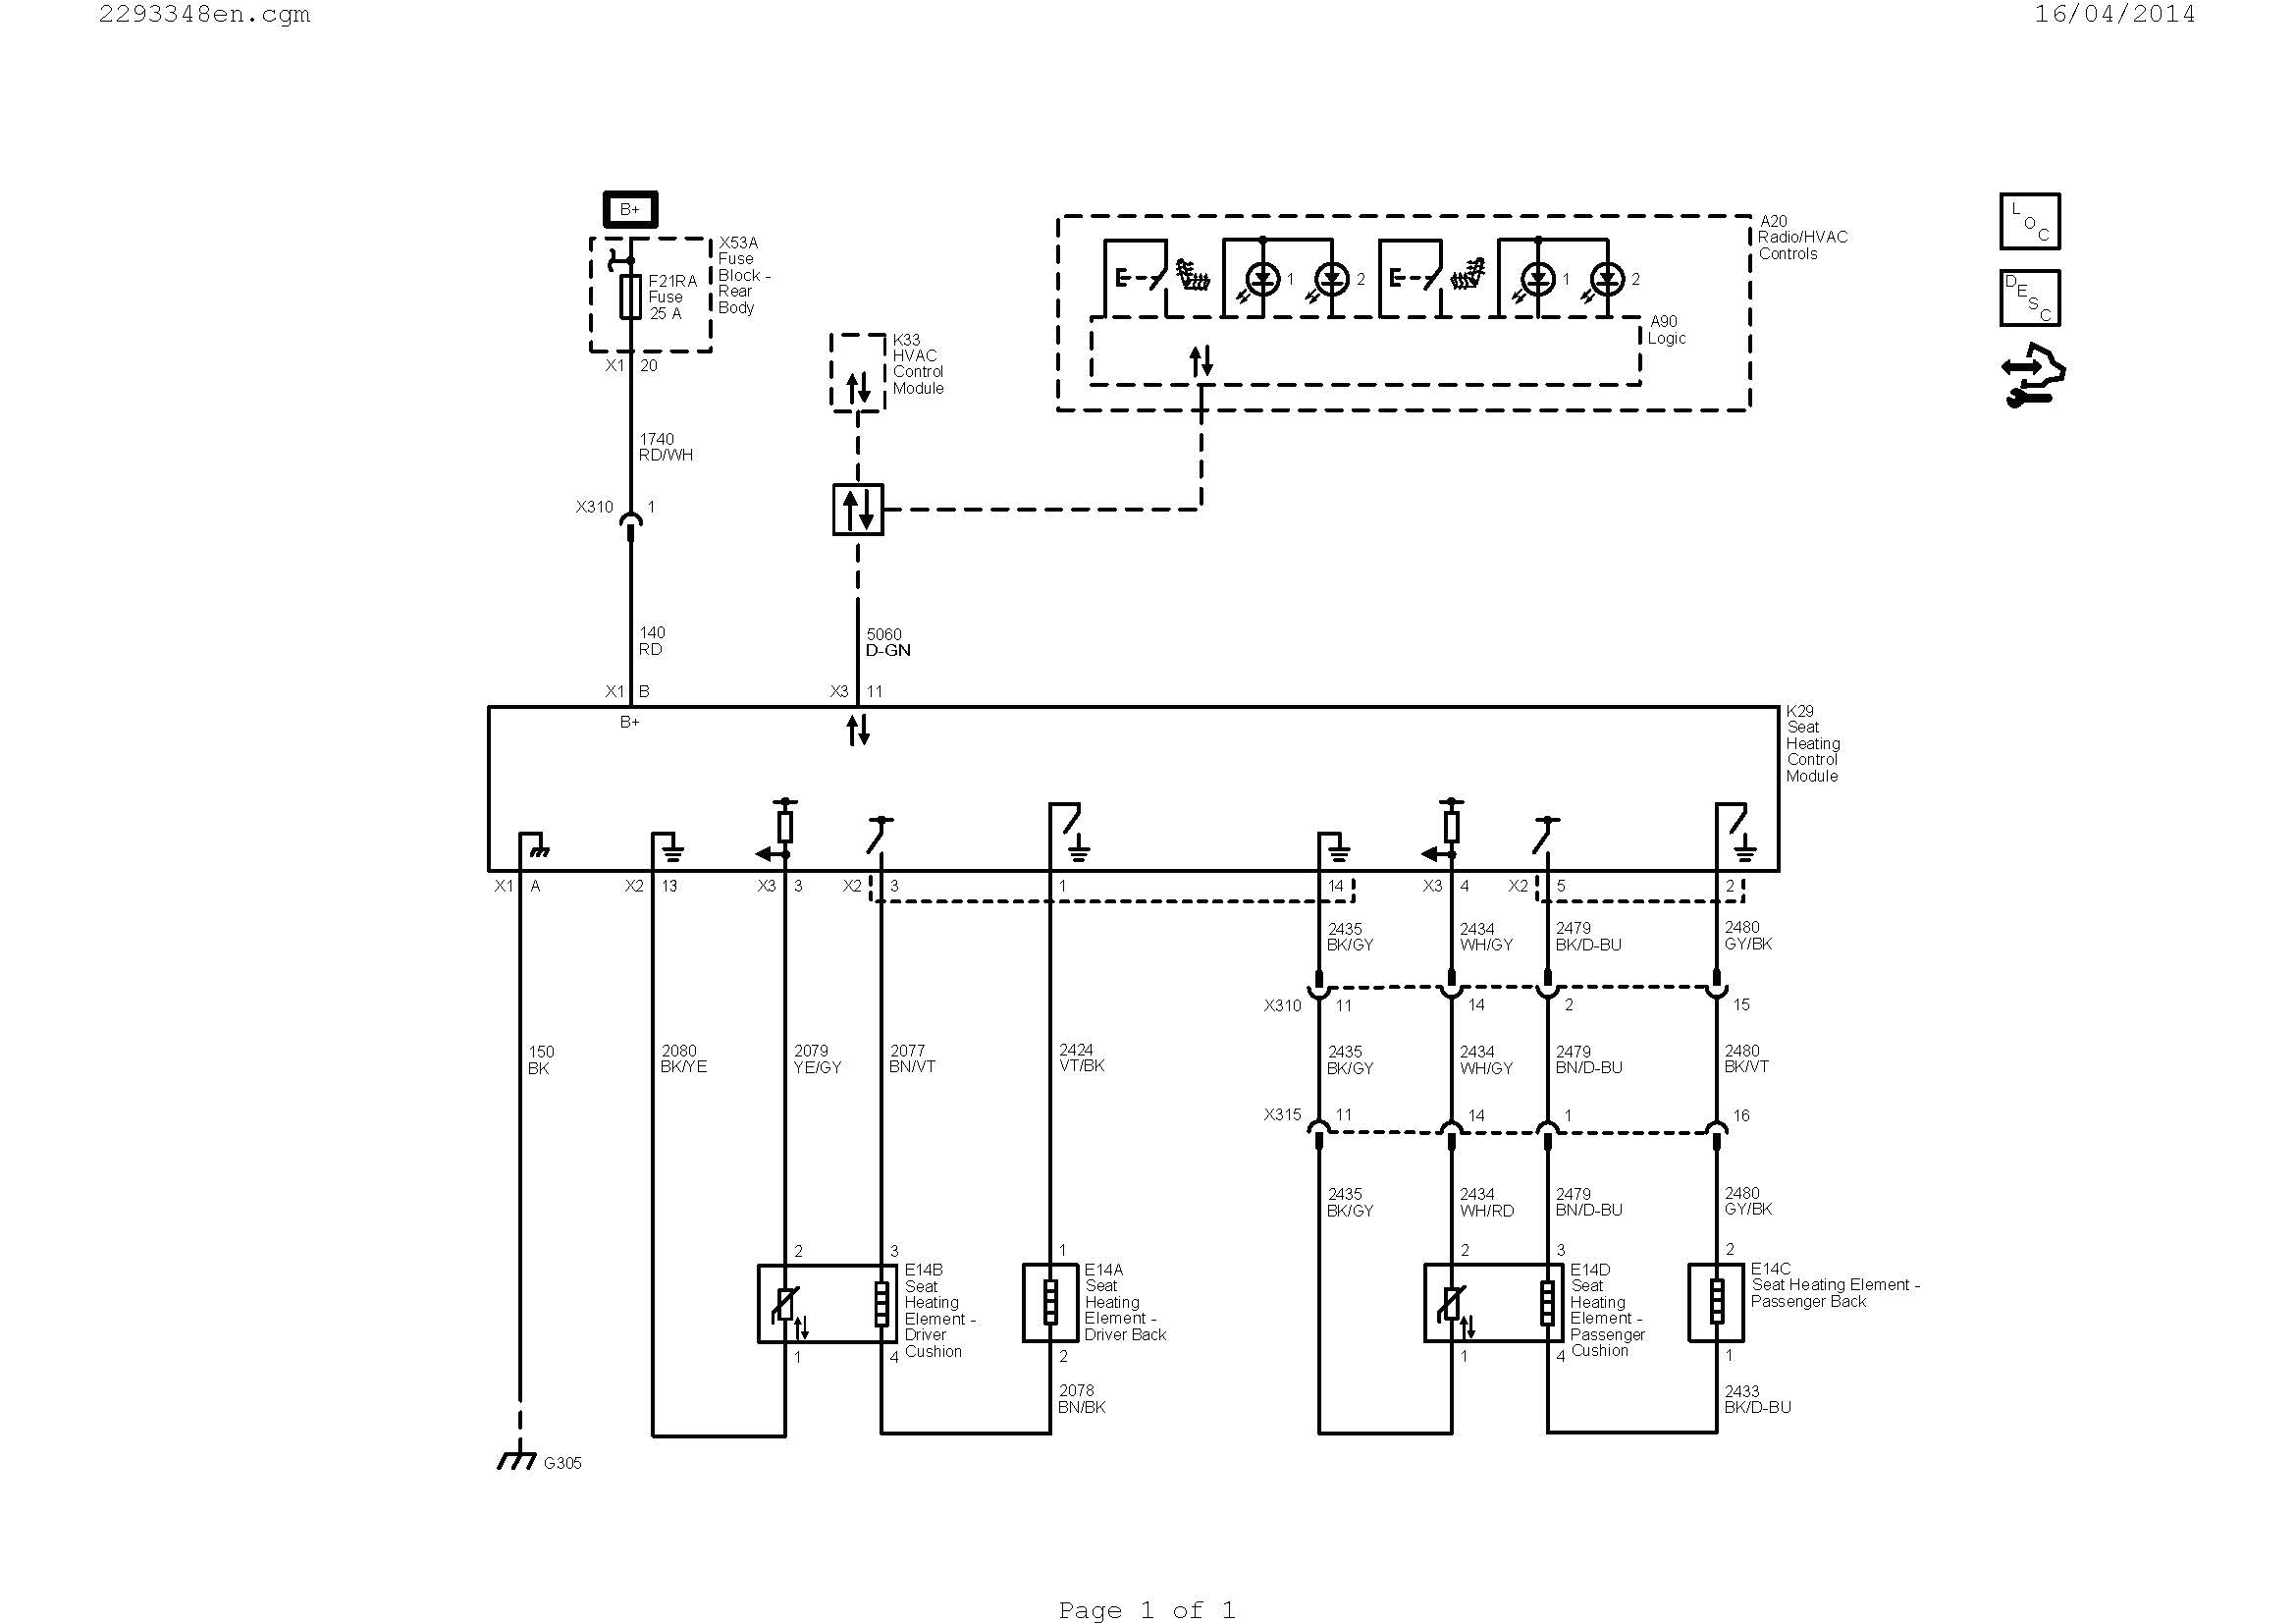 hvac control panel wiring diagram electrical wiring diagrams new phone wiring diagram new best wiring diagram od rv park electrical 6m jpg